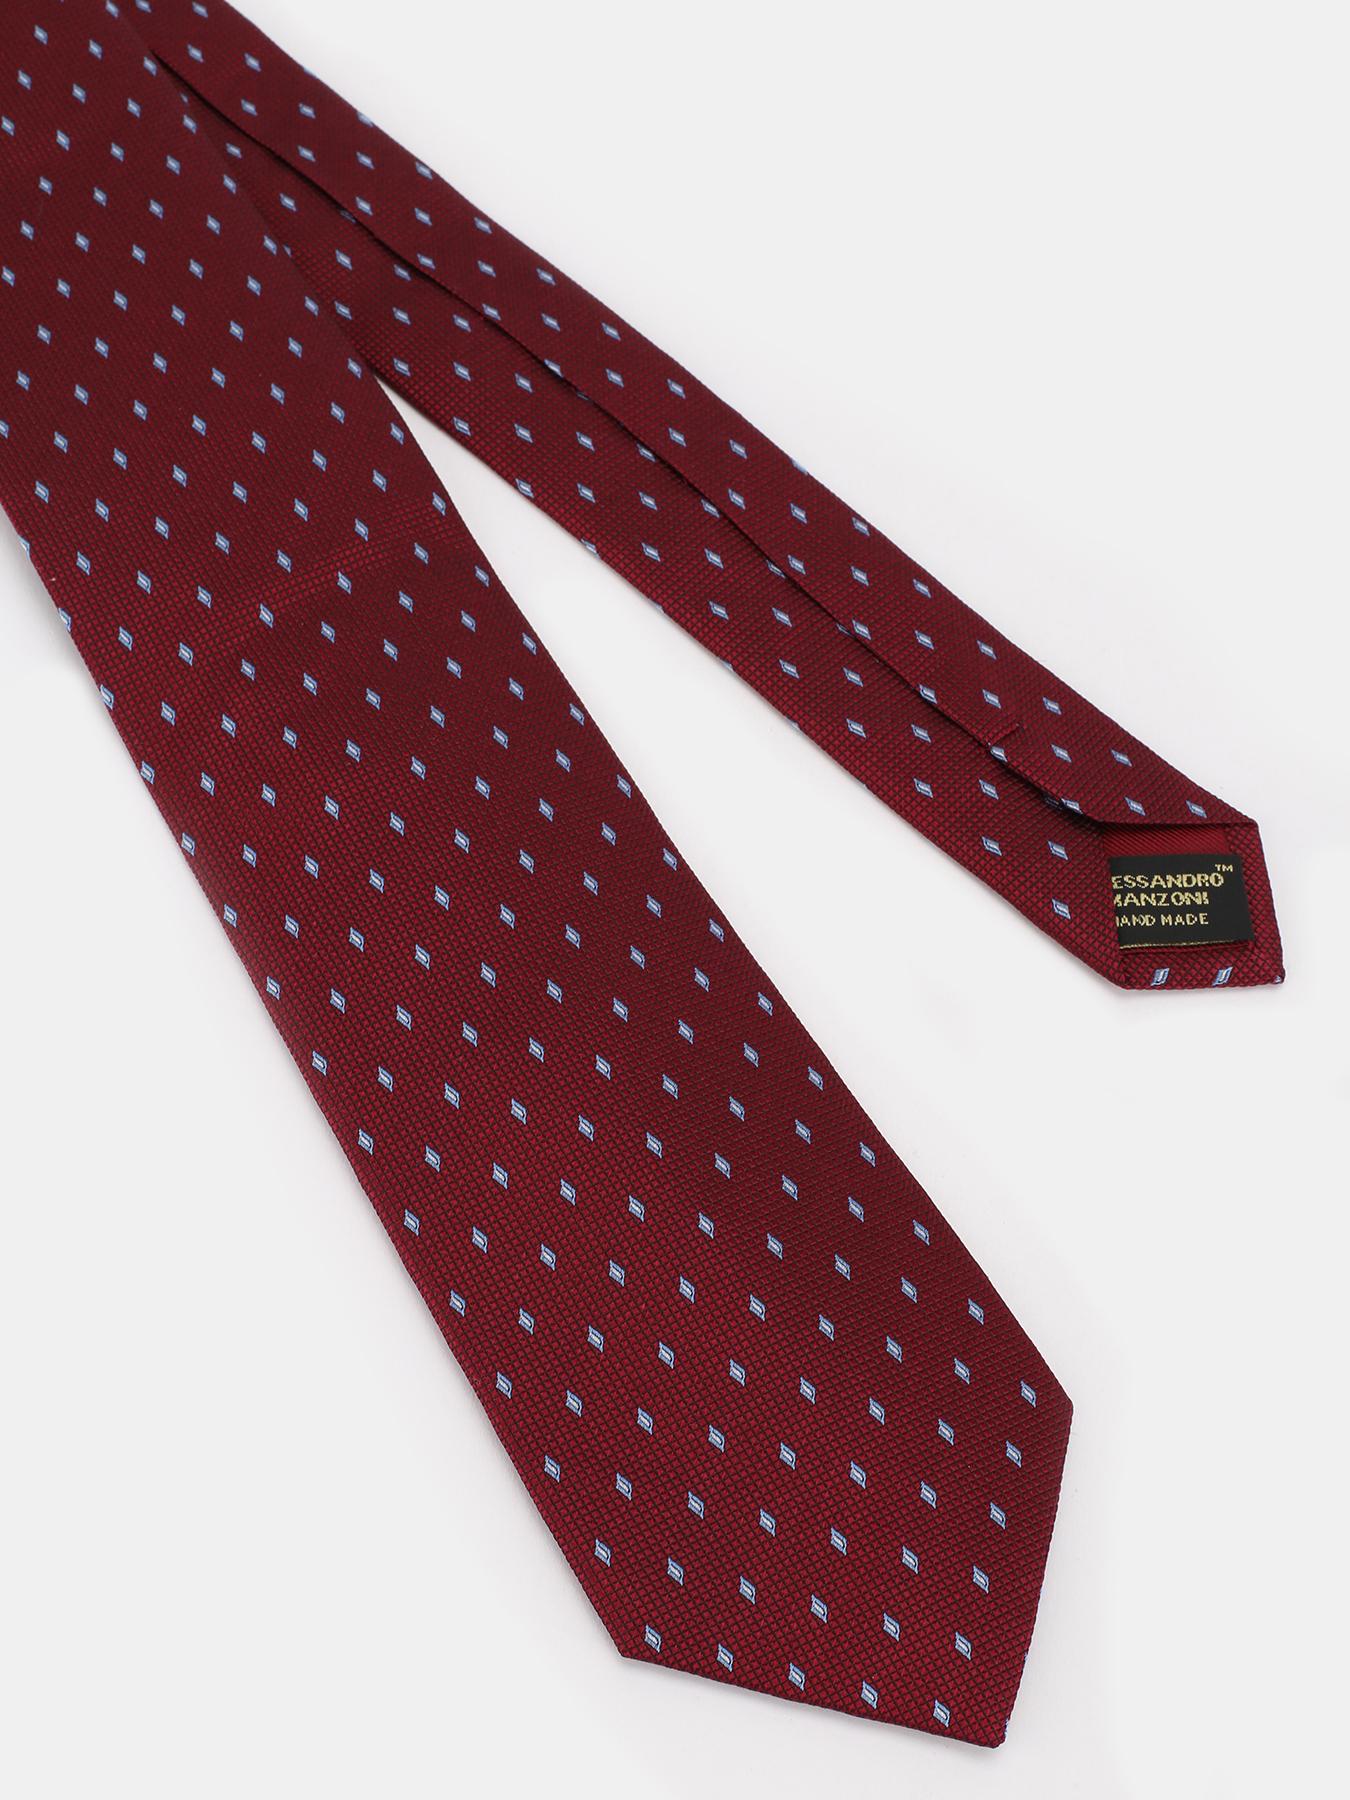 Alessandro Manzoni Шелковый галстук с узорами 324187-185 Фото 3